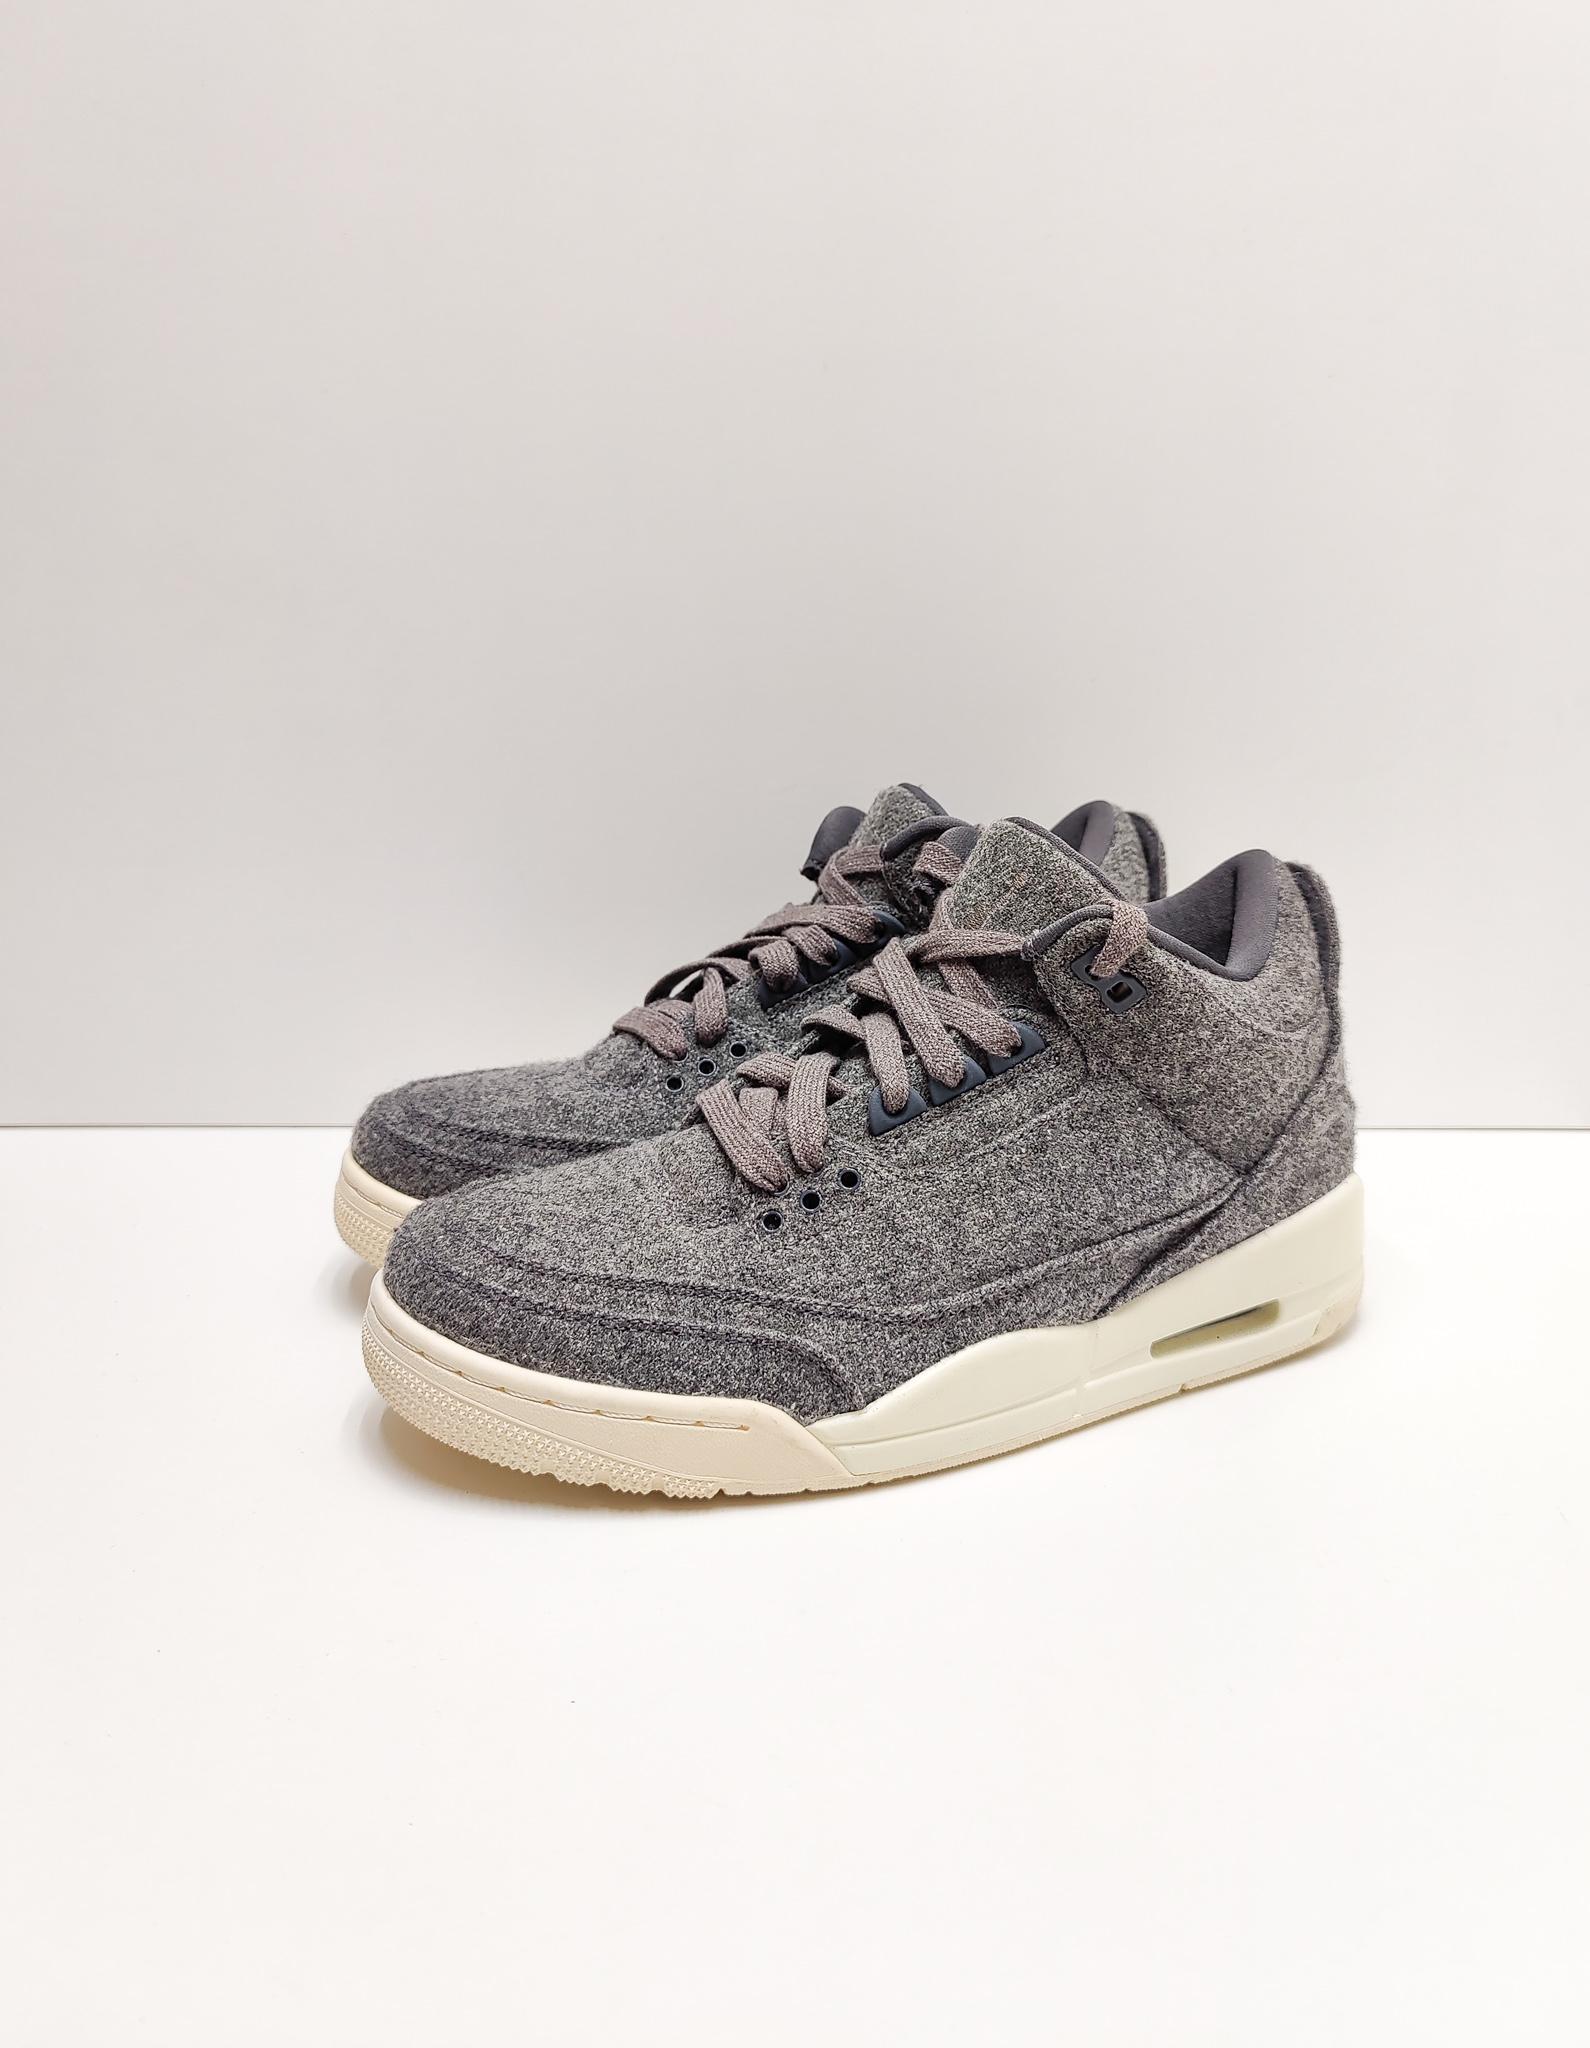 Jordan 3 Retro Wool